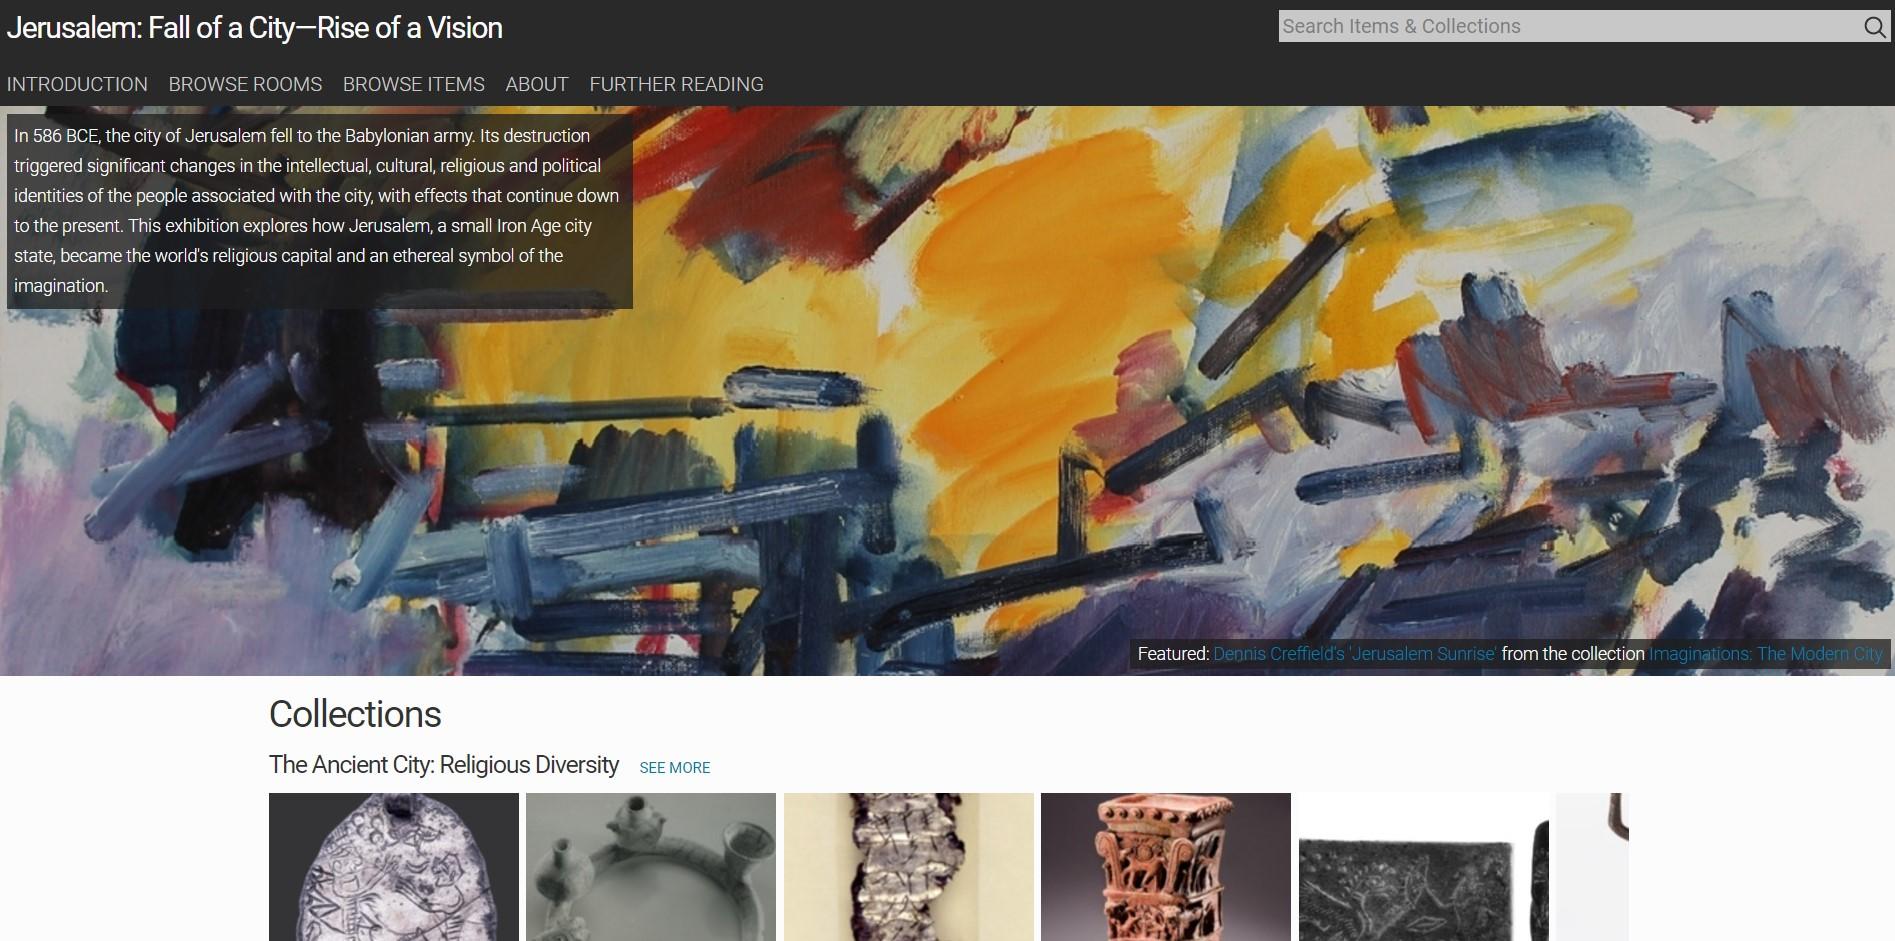 Image of the Jerusalem exhibition website